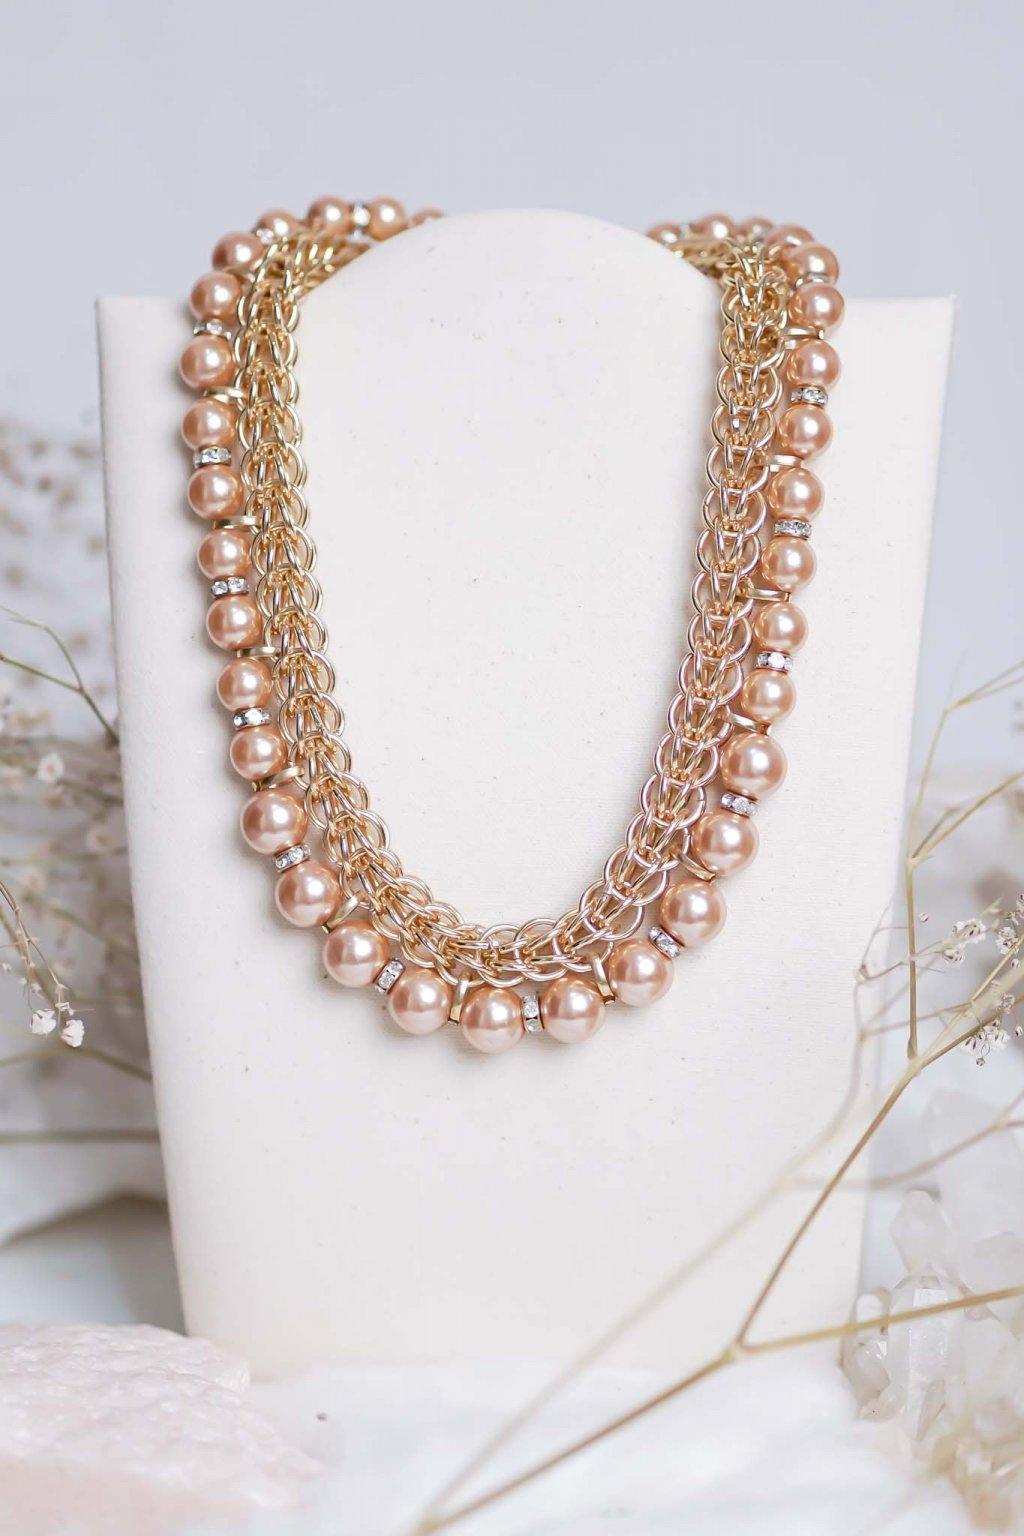 náhrdelník, šperk, spoločenská náhrdelník, náhrdelník na bežný deň, výrazný náhrdelník, jemný náhrdelník, šperky, náhrdelník na ples, svadbu, stužkovú 11